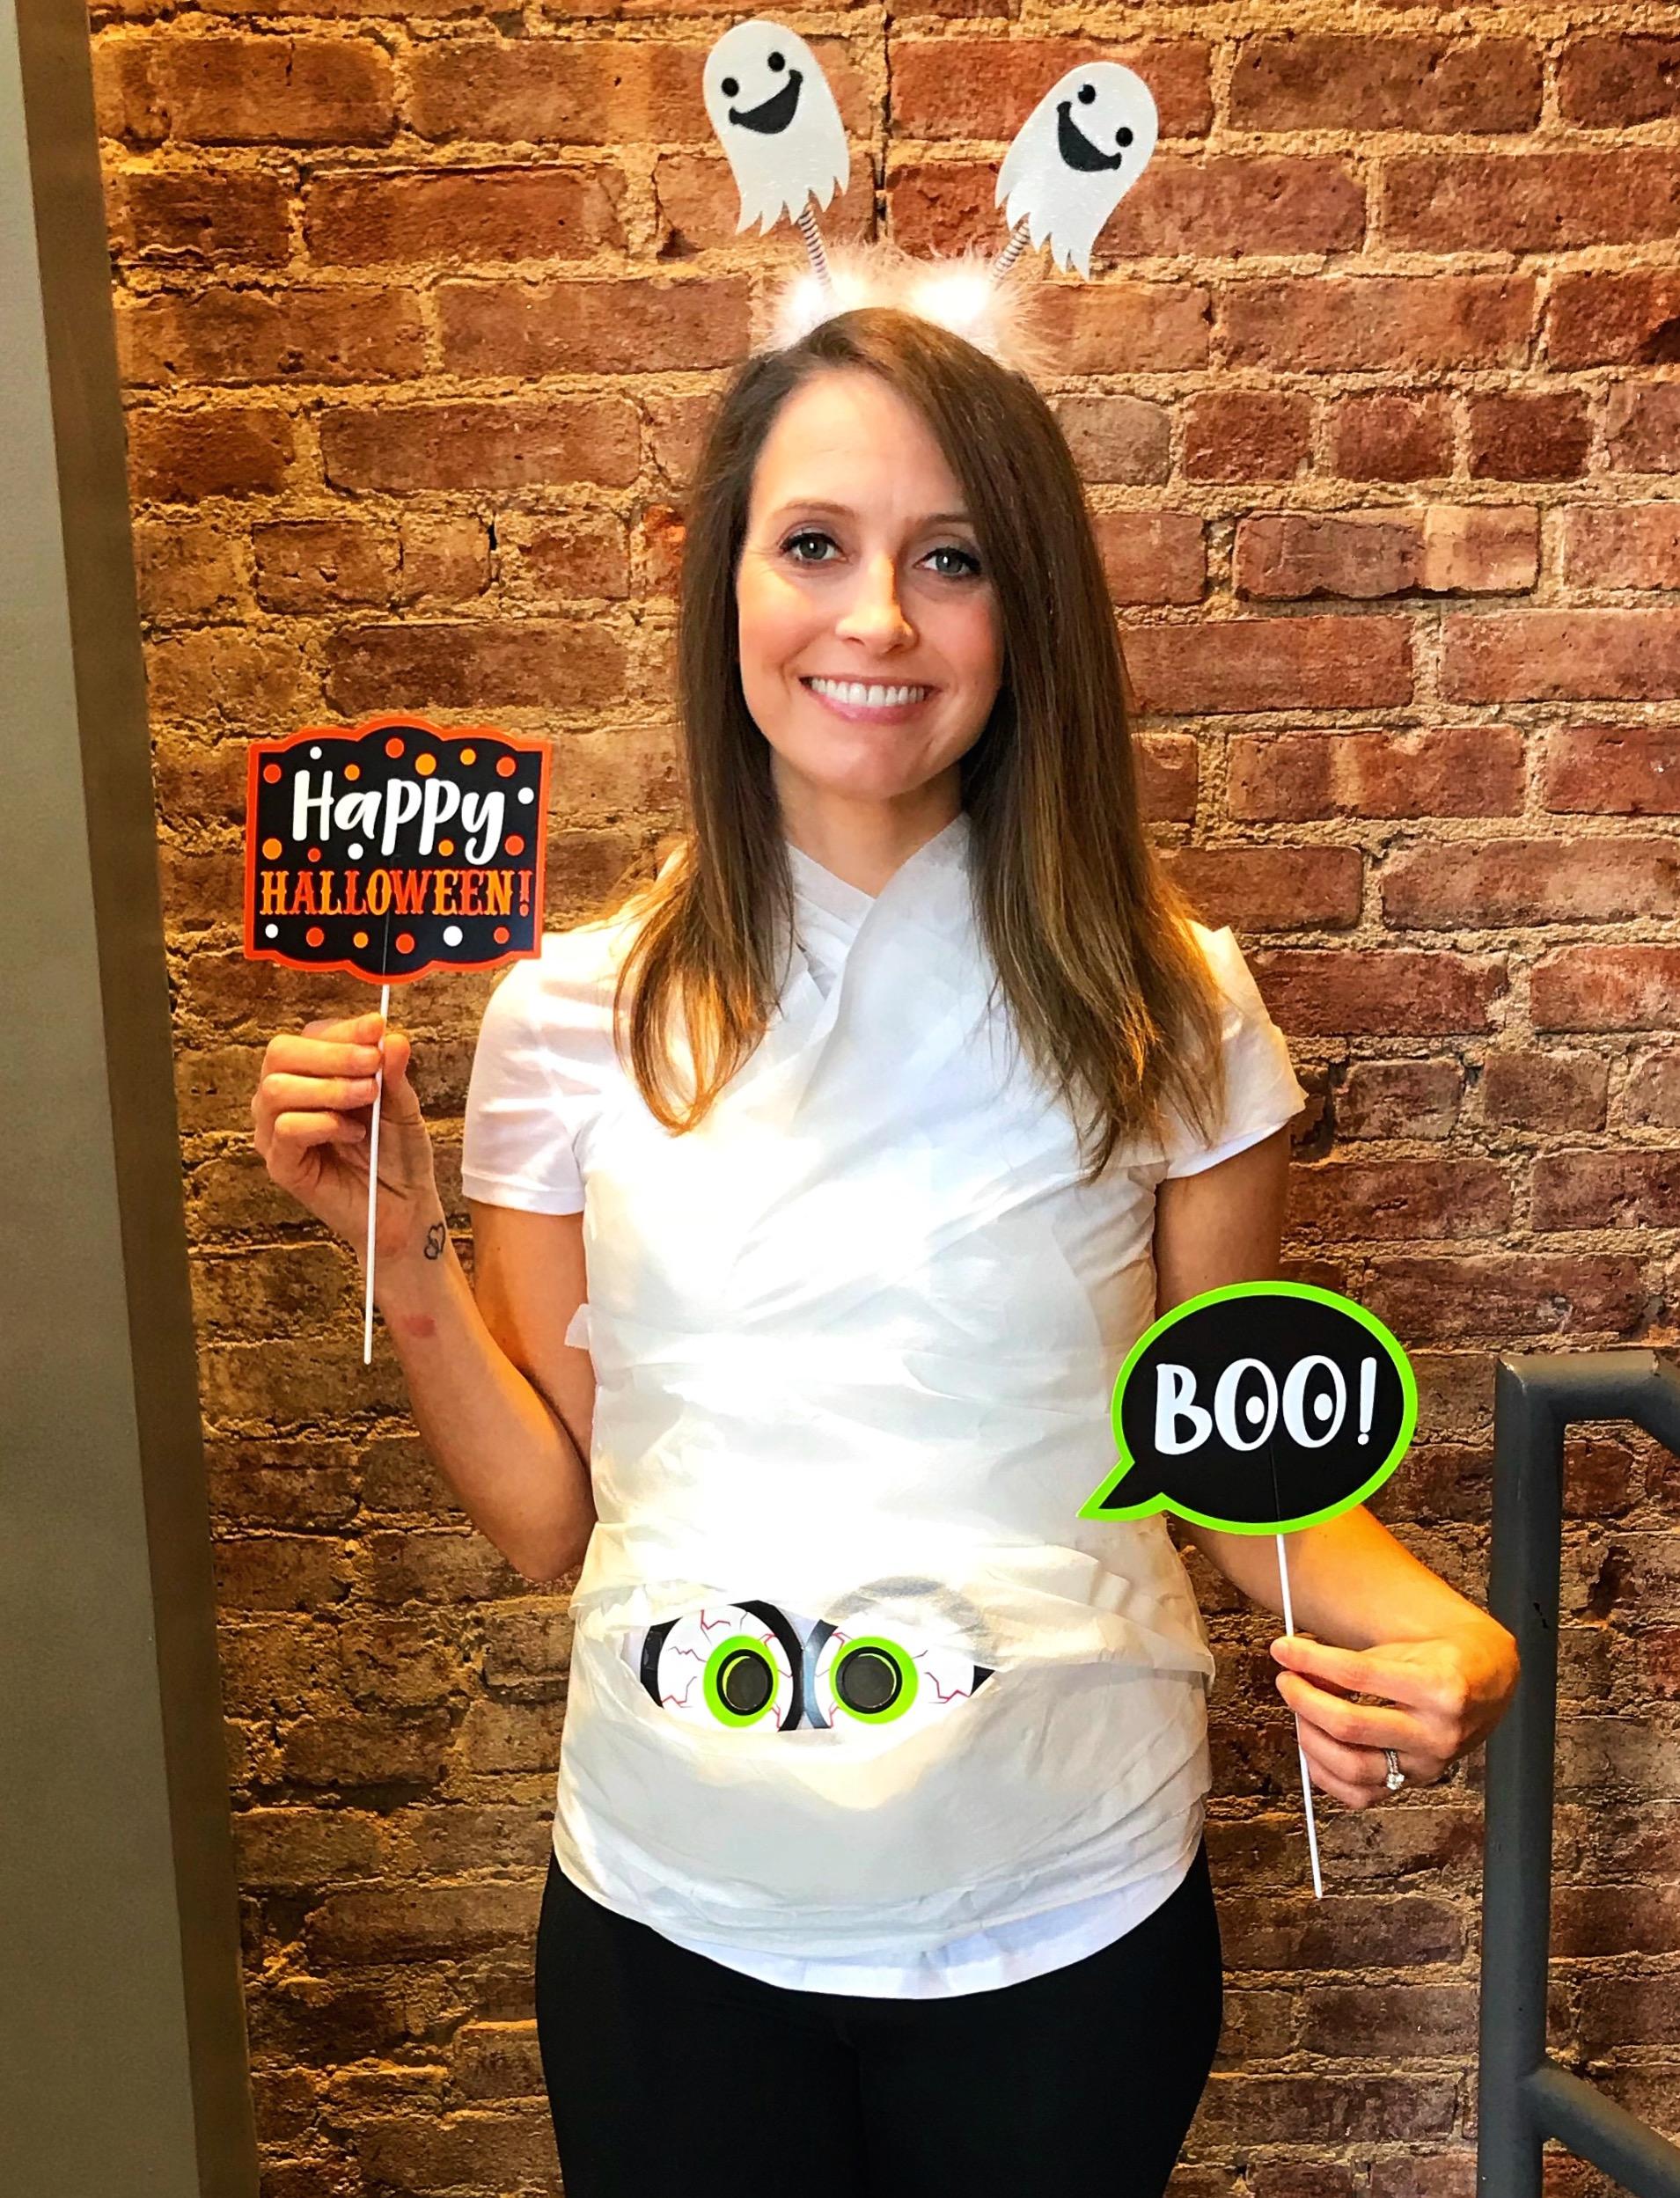 Heather 19 weeks pregnent halloween